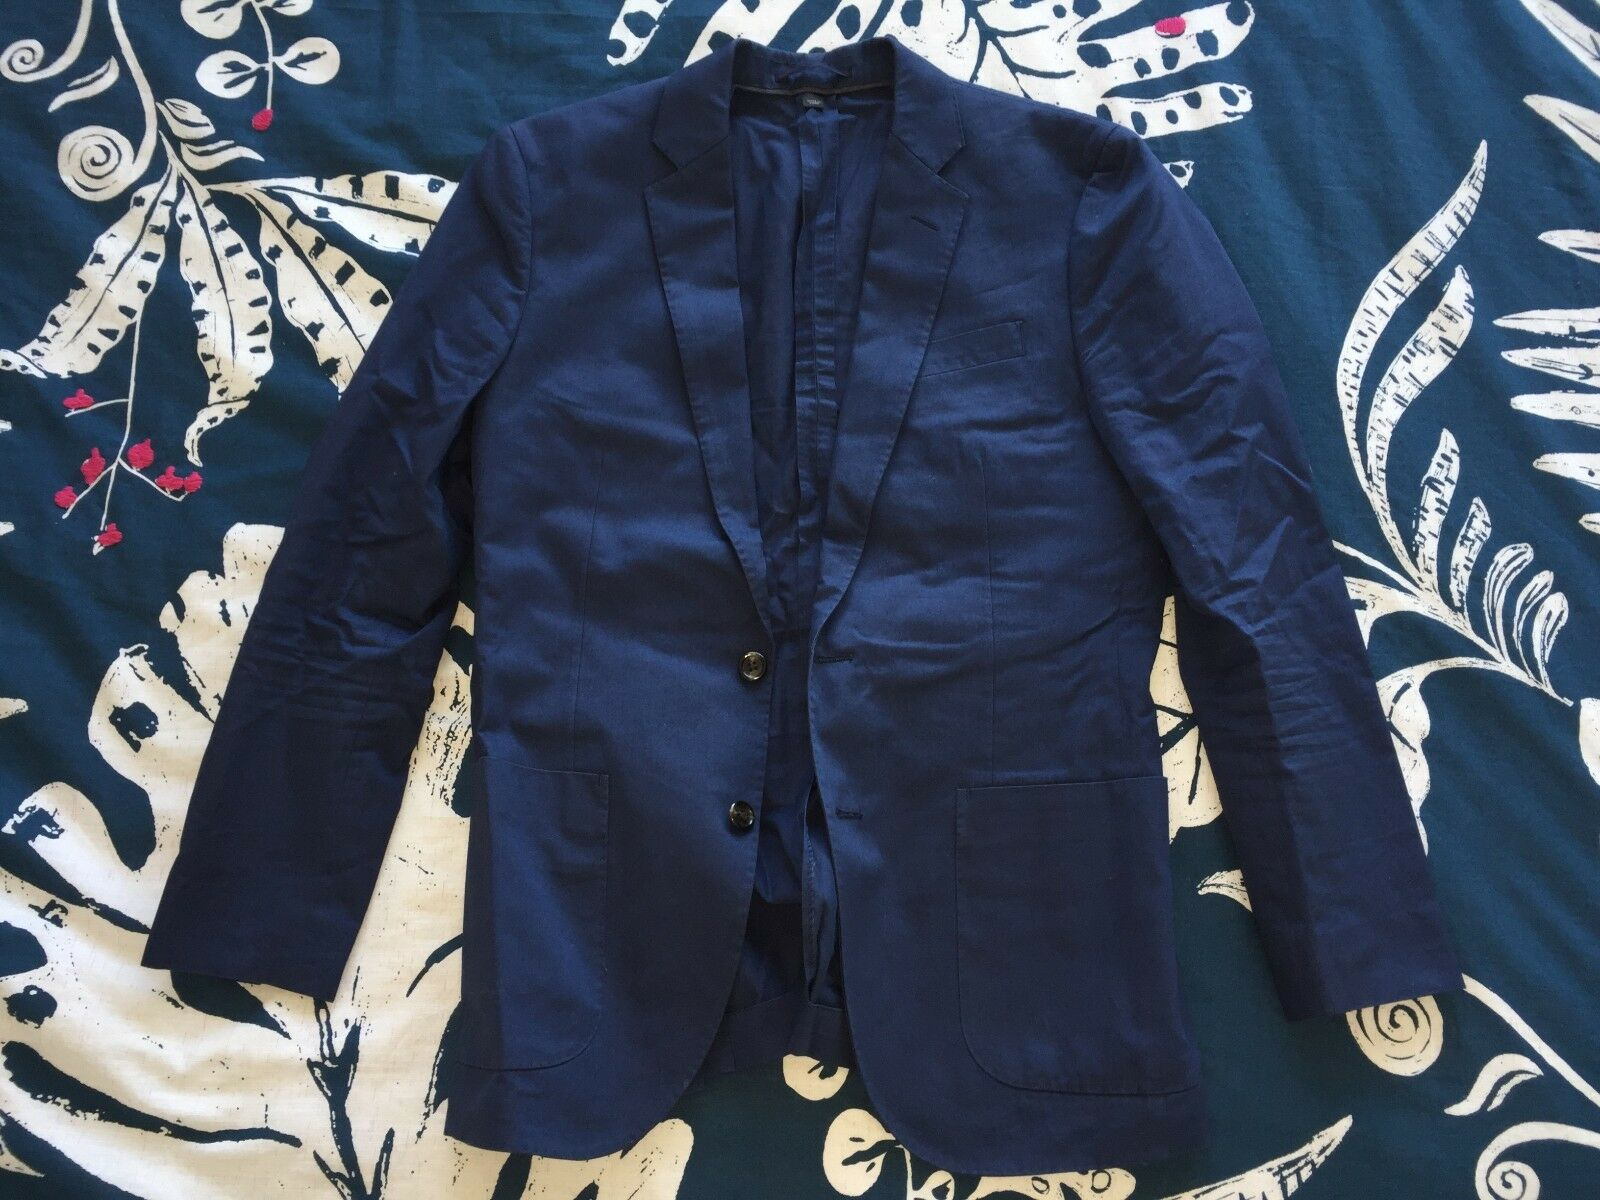 Herren J Crew Ludlow blazer Sport coat in Italian cotton 36S Blau 2 Button